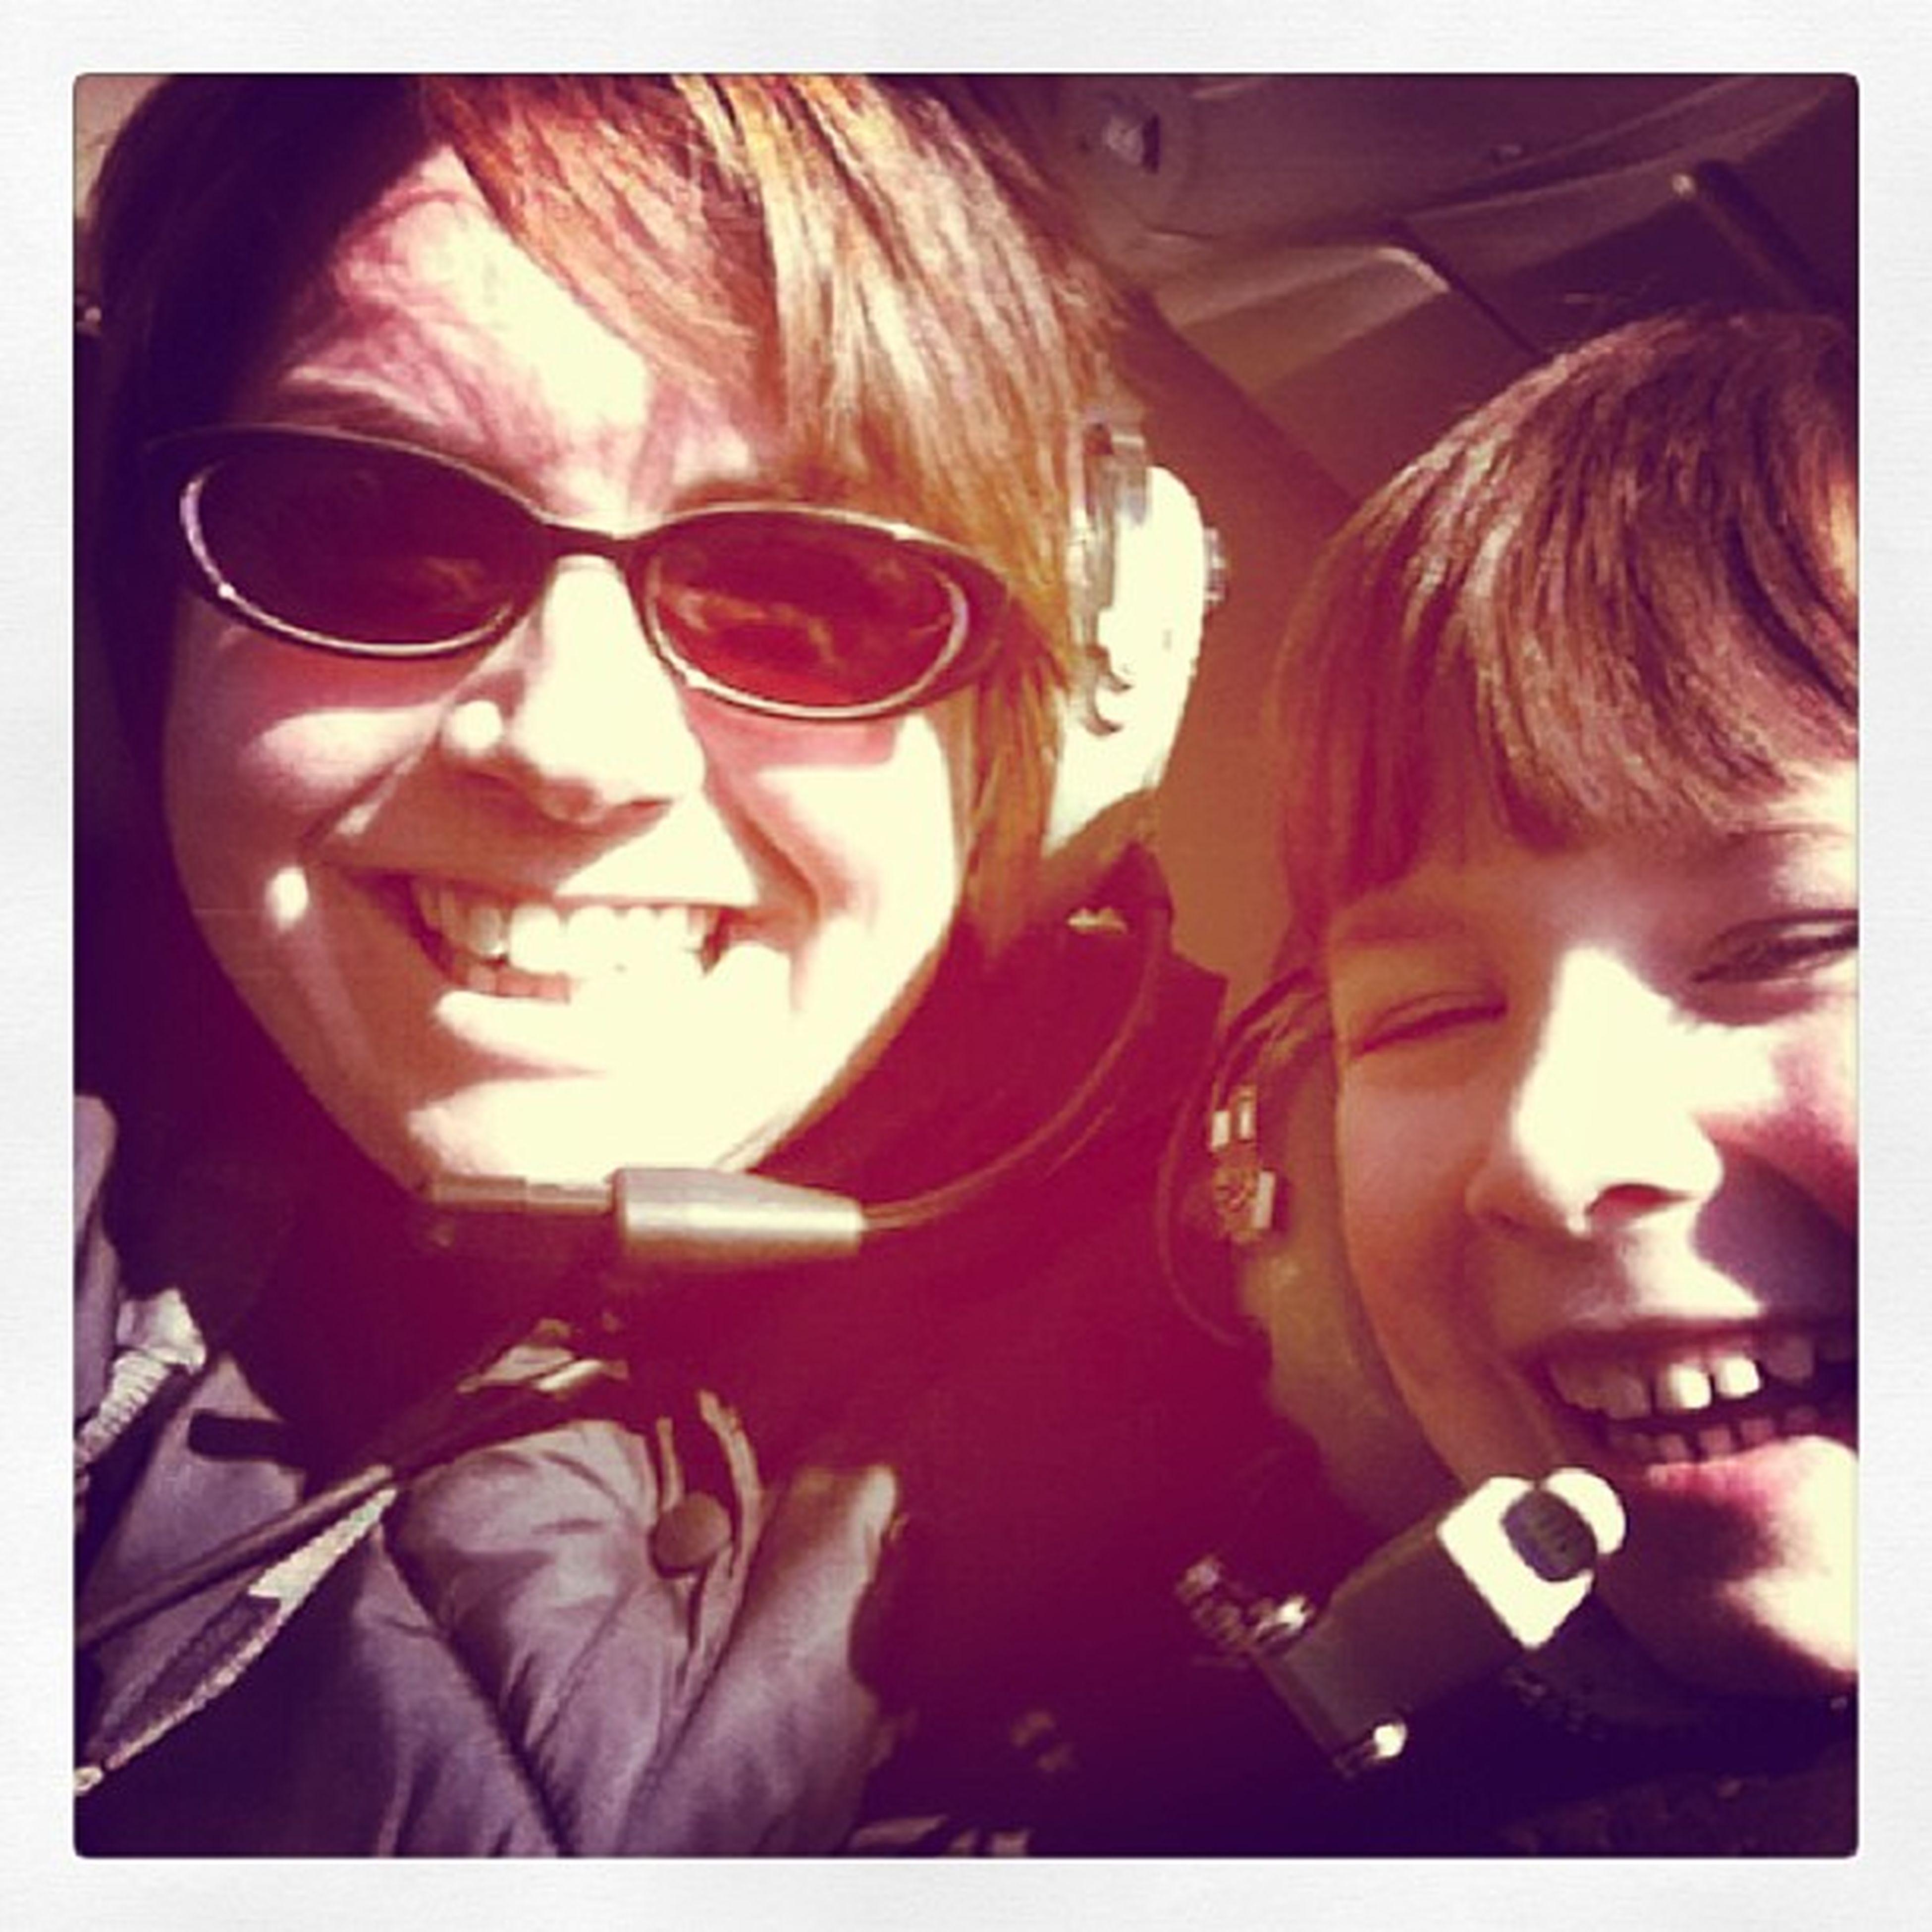 Mom & G ready for take off #skywagons #newyearplaneride Newyearplaneride Skywagons